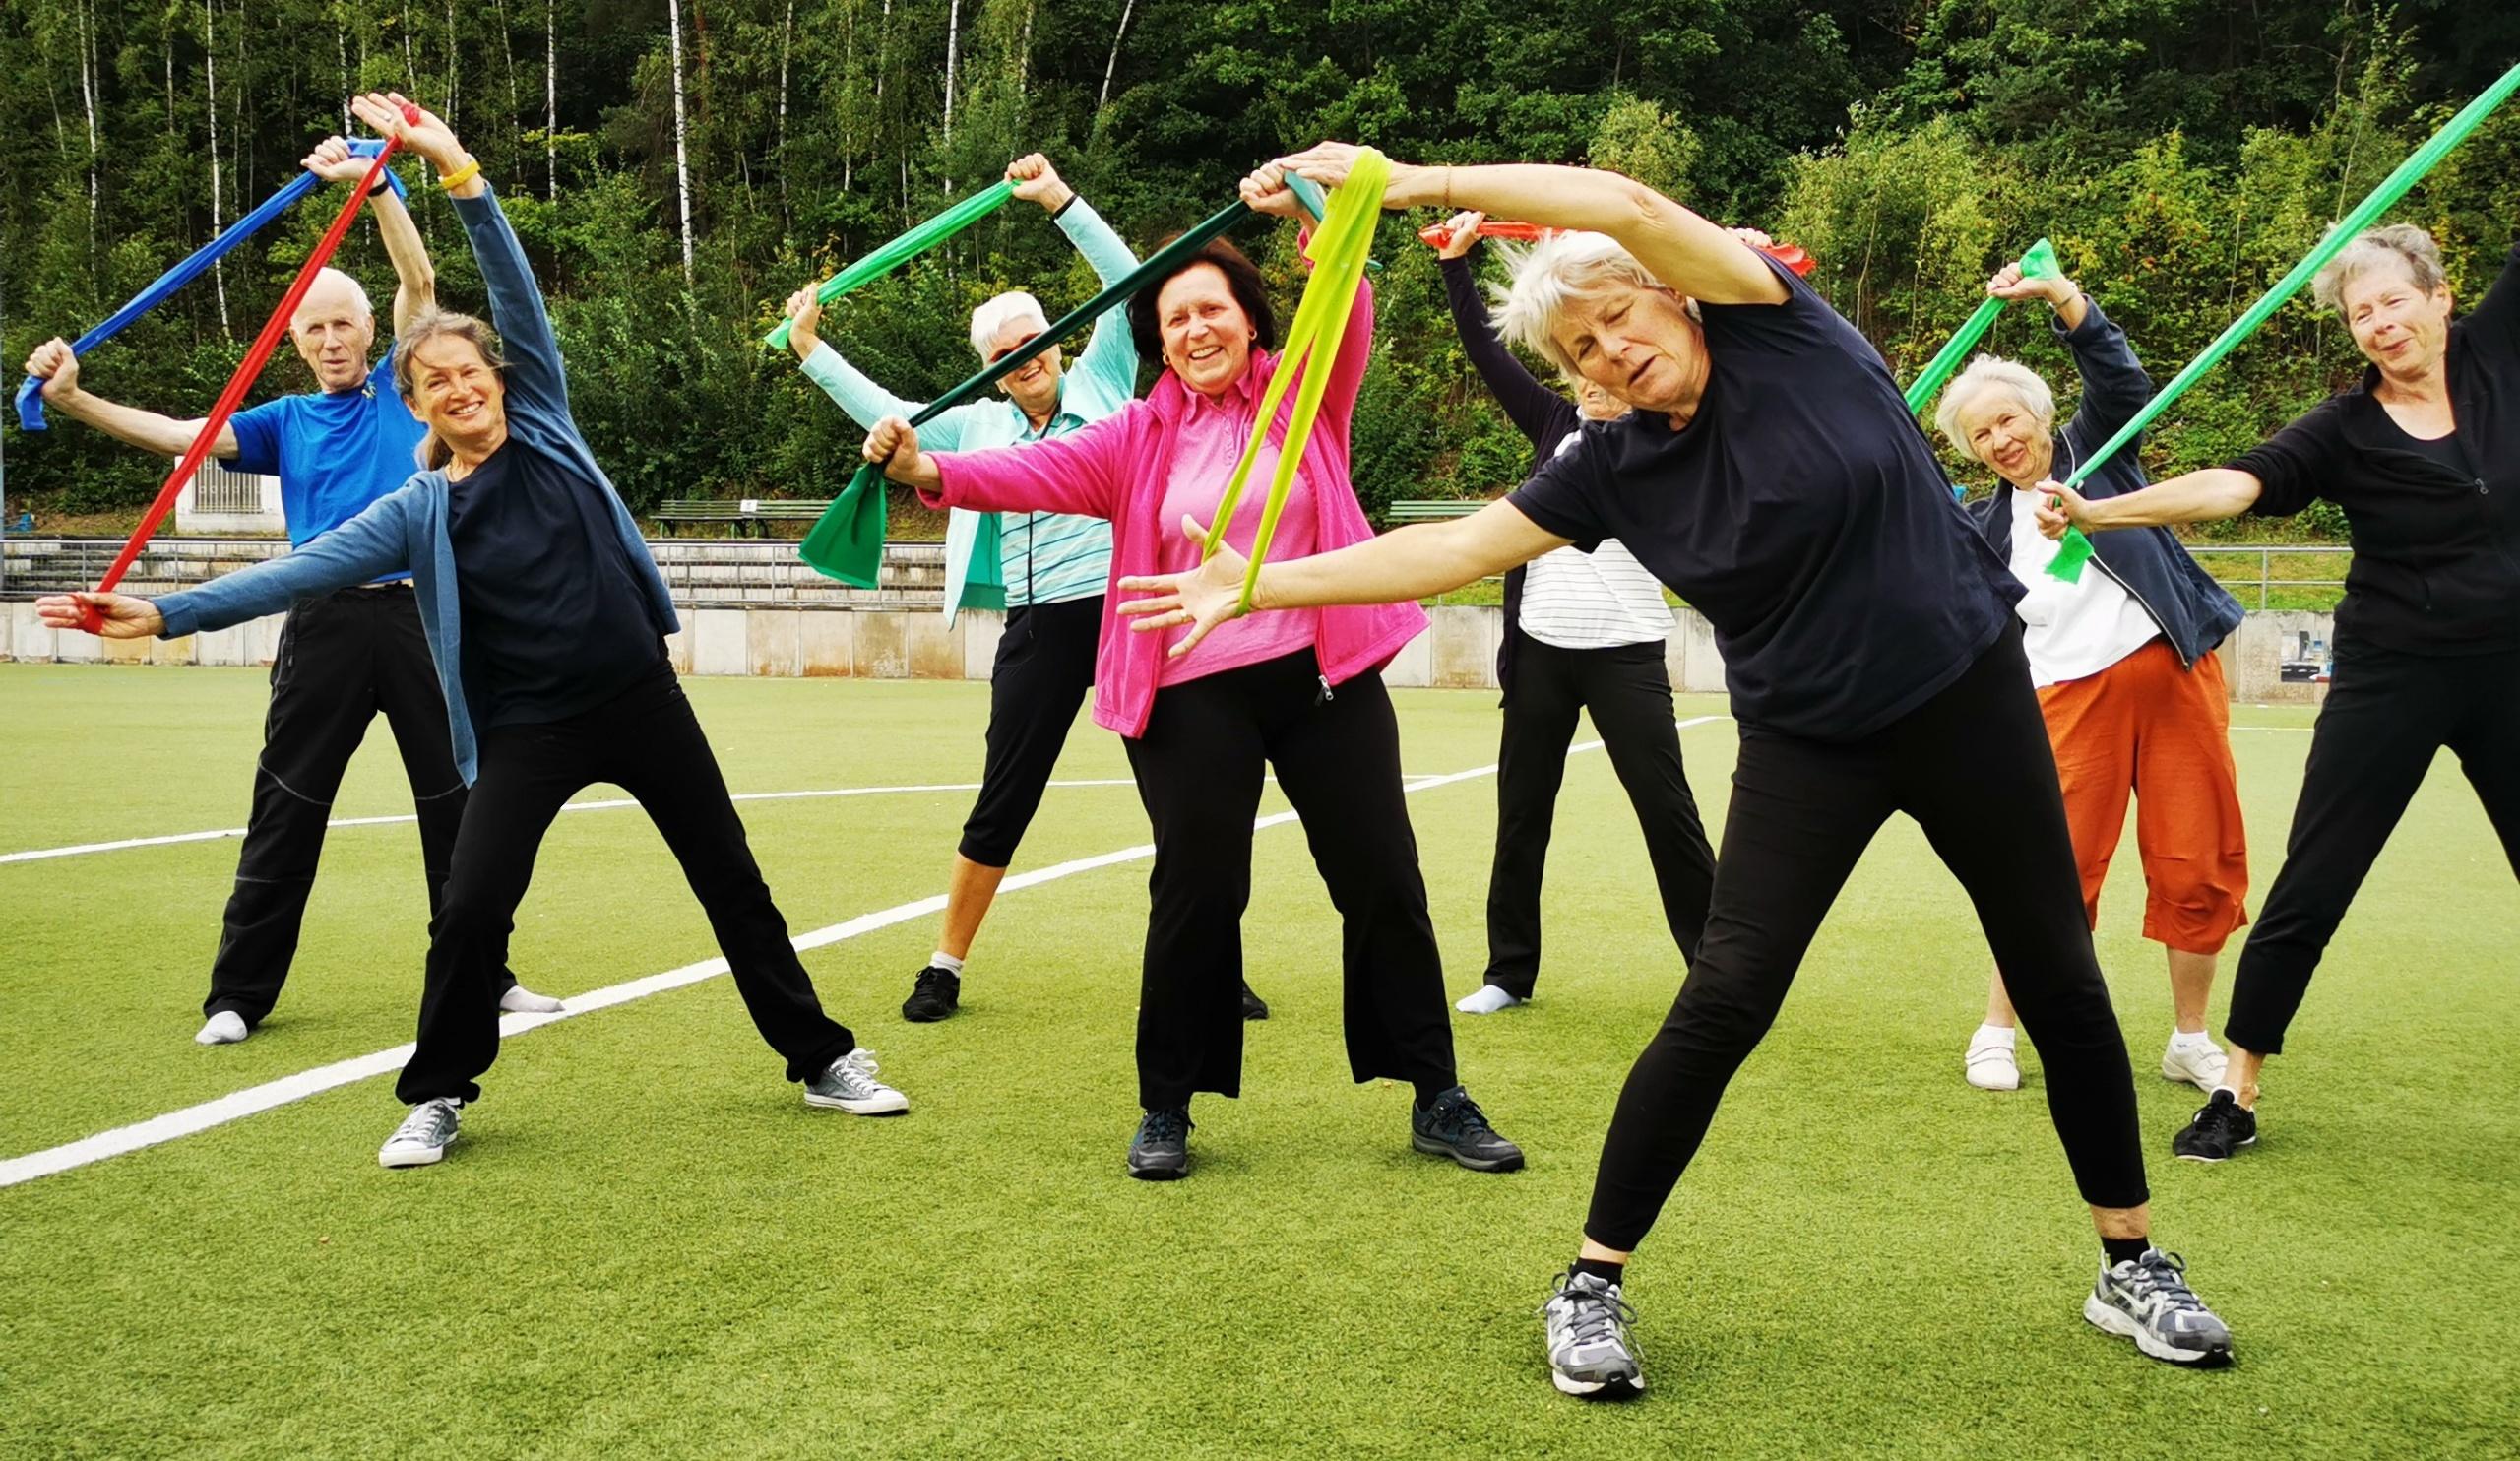 Gymnastik/Aktiv älter